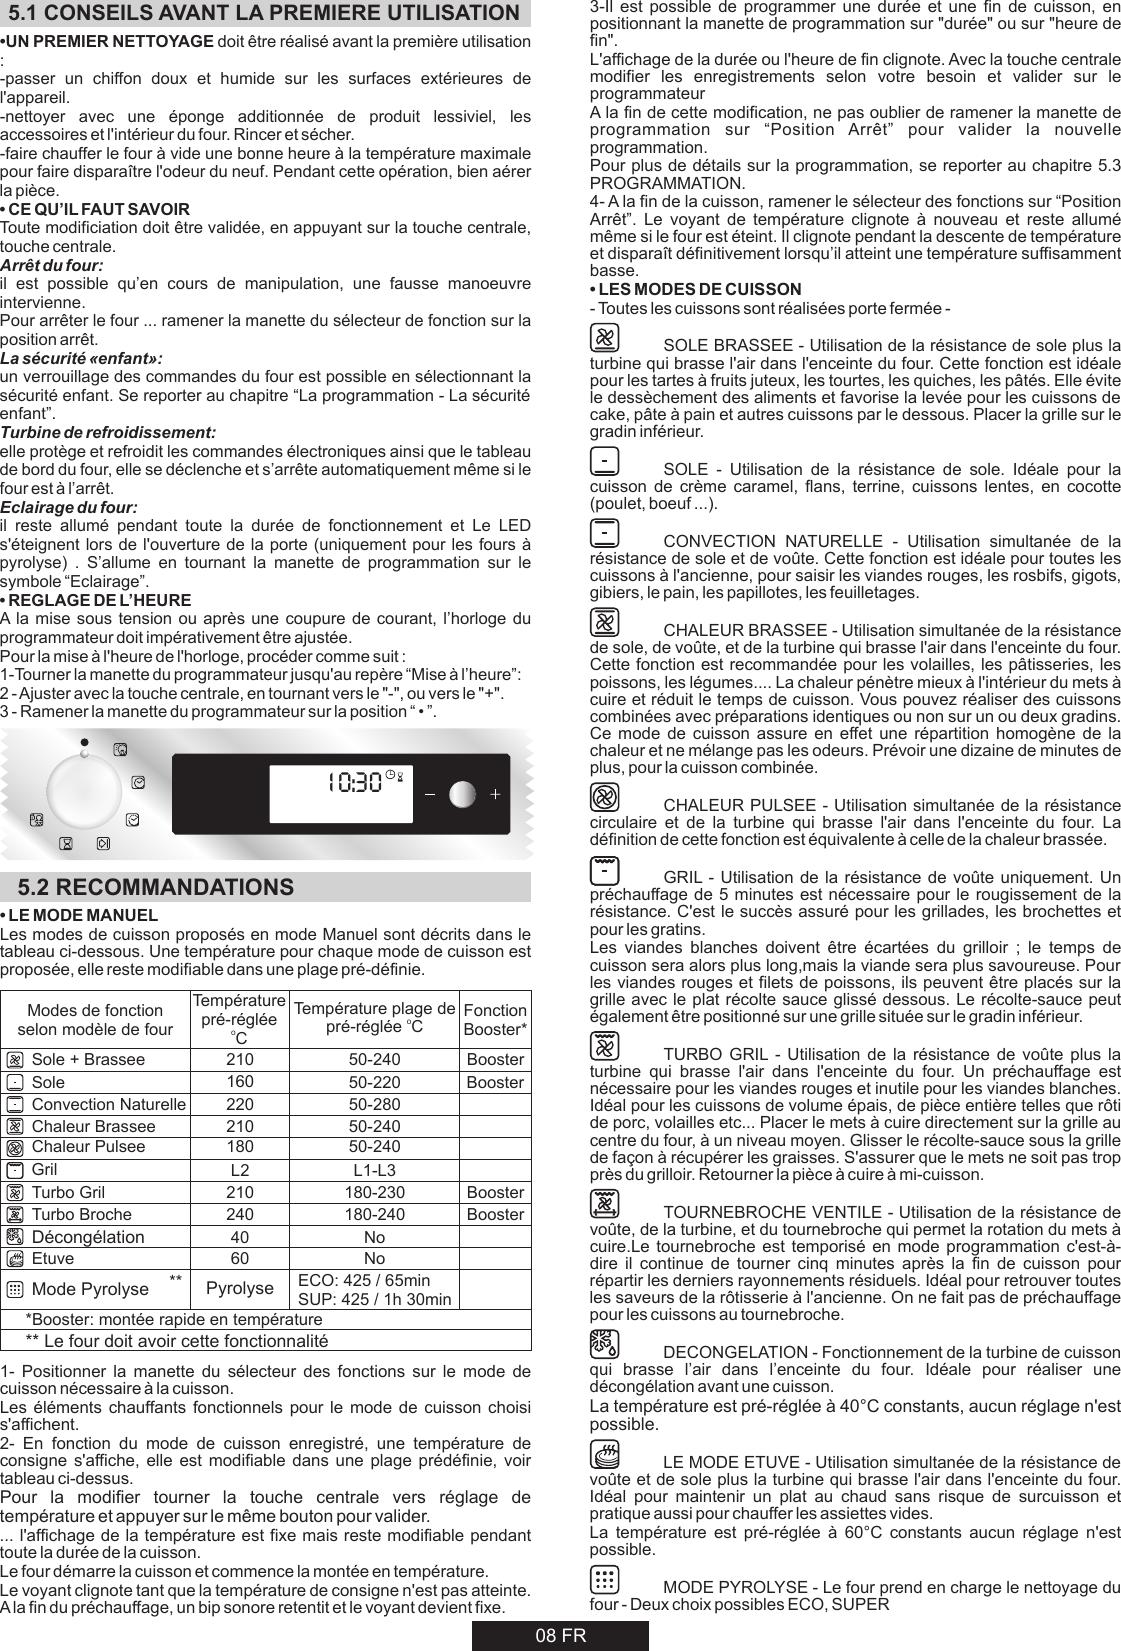 Four A Chaleur Brassee hoover prodige multi function oven hoa 03 vxsc instruction